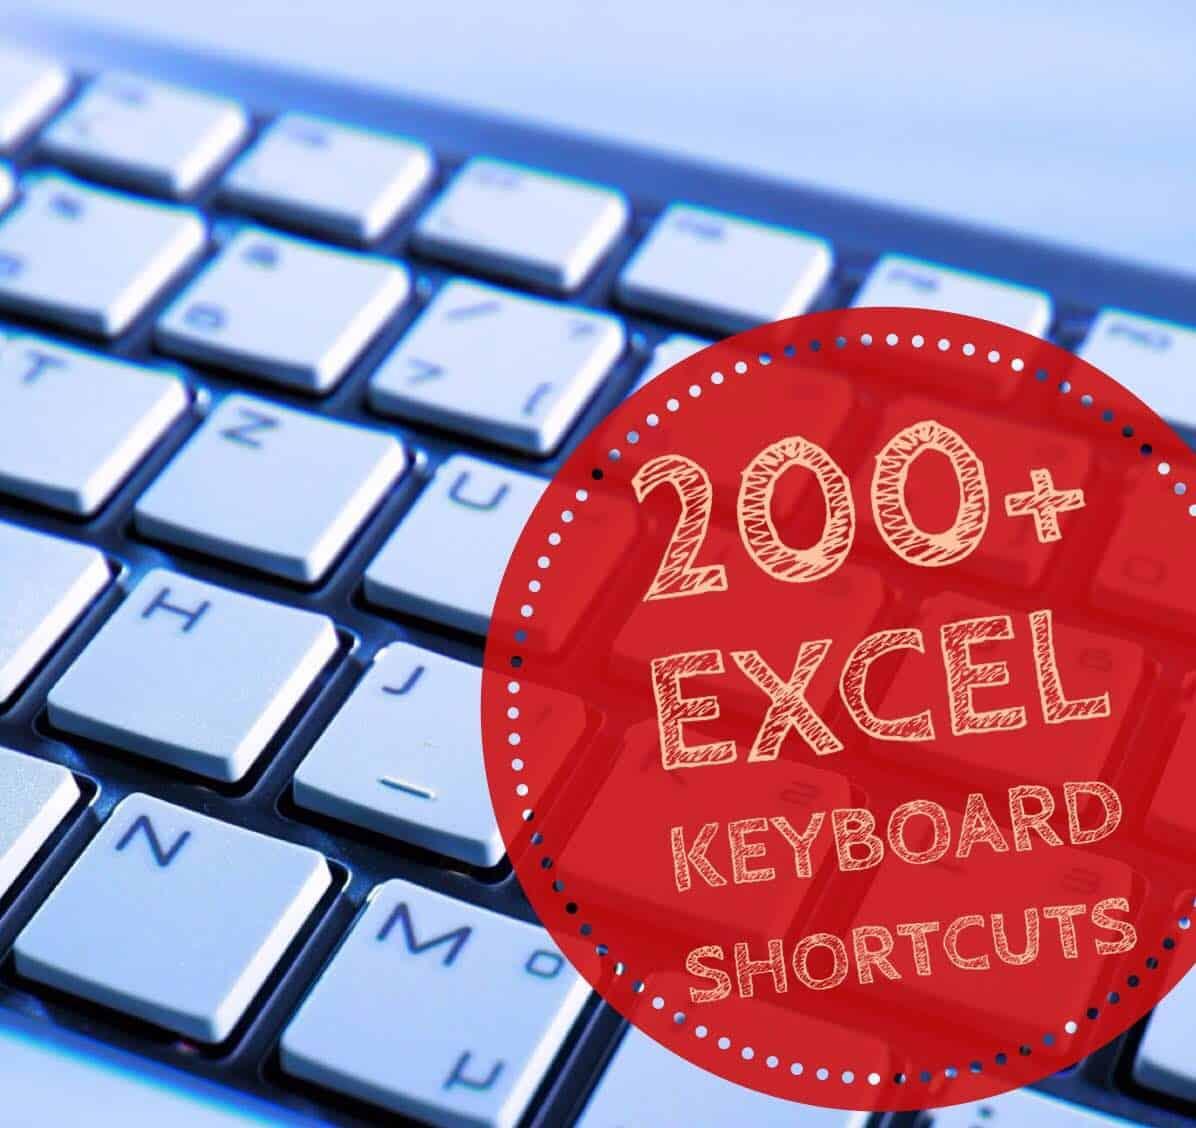 200 Excel Keyboard Shortcuts